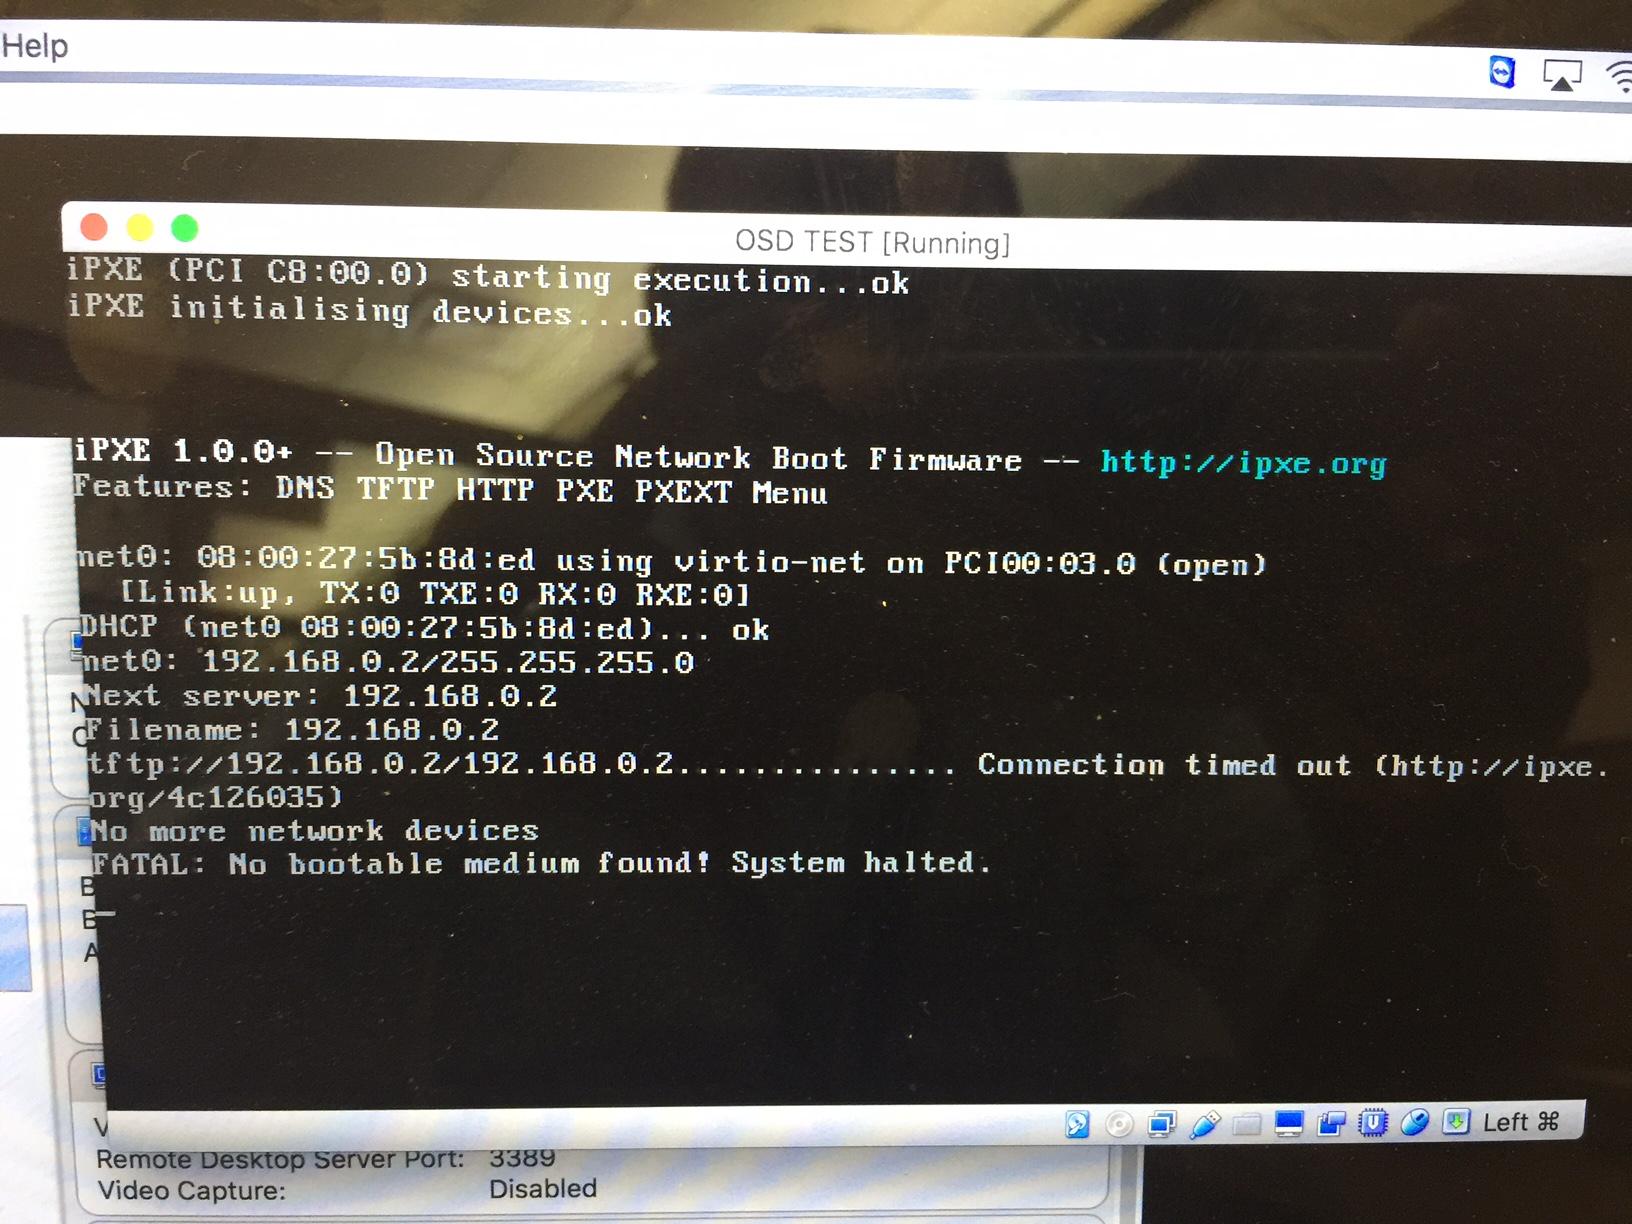 No bootable medium found   system halted